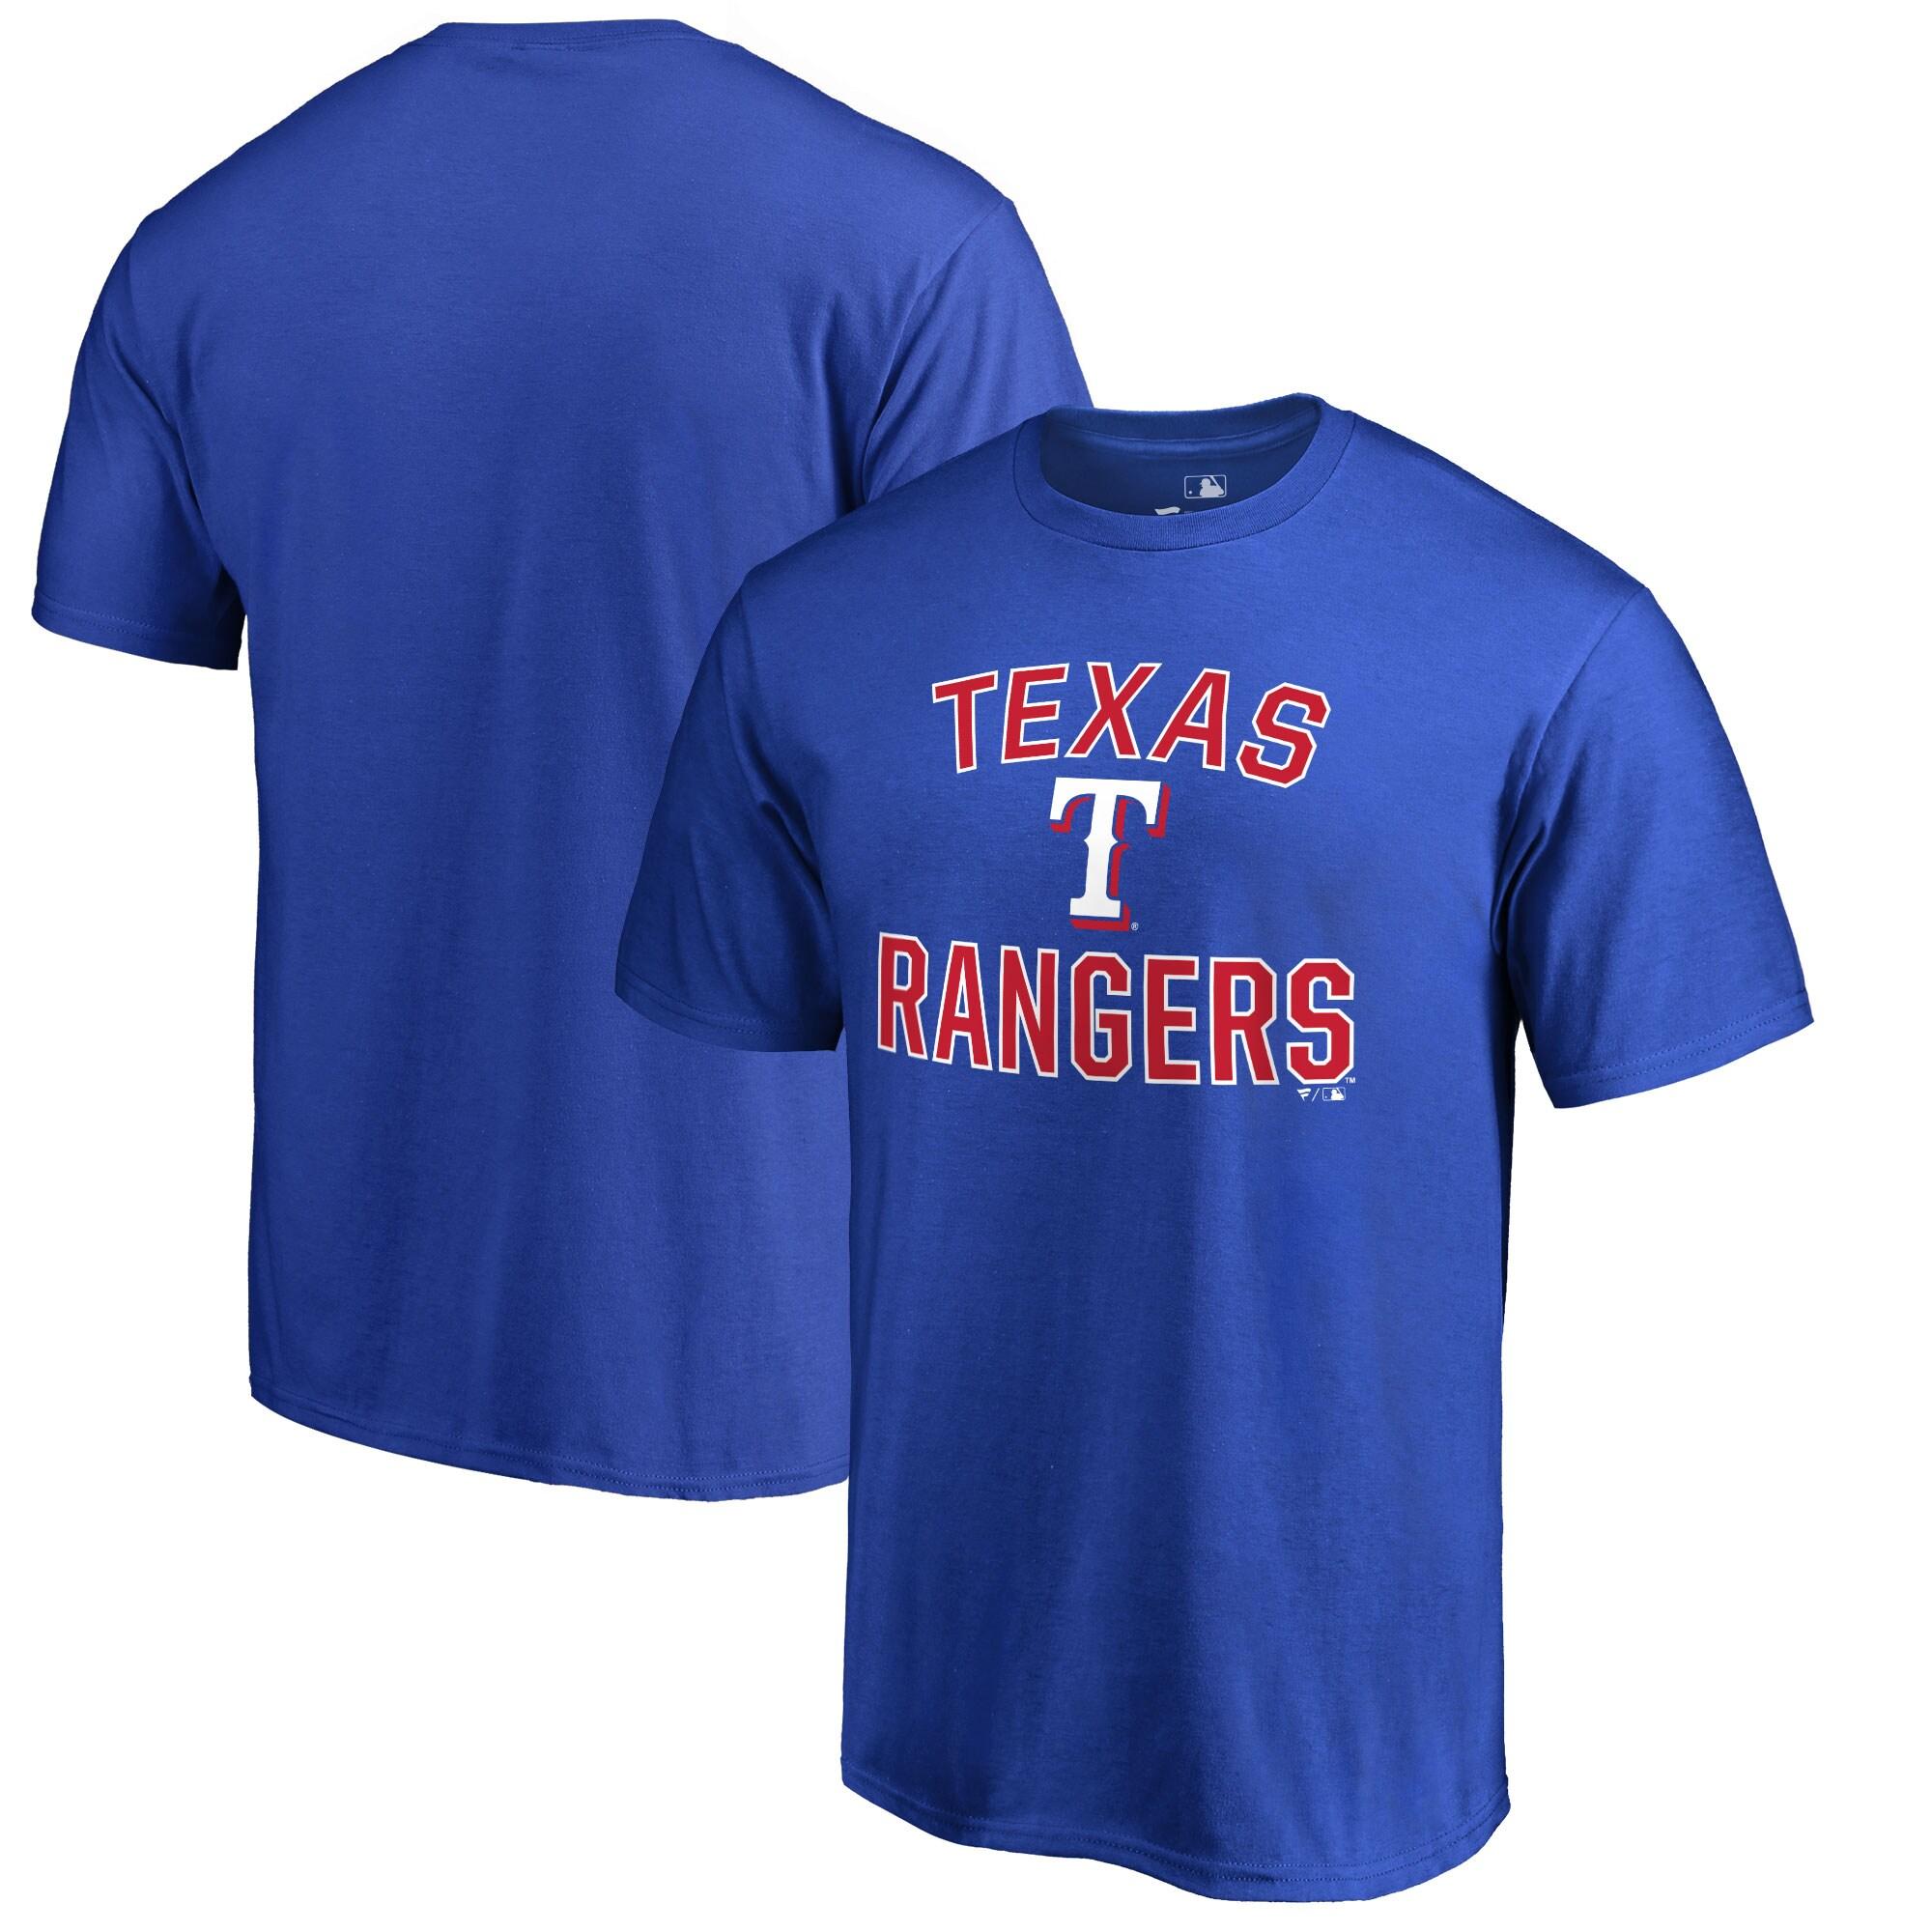 Texas Rangers Victory Arch Big & Tall T-Shirt - Blue